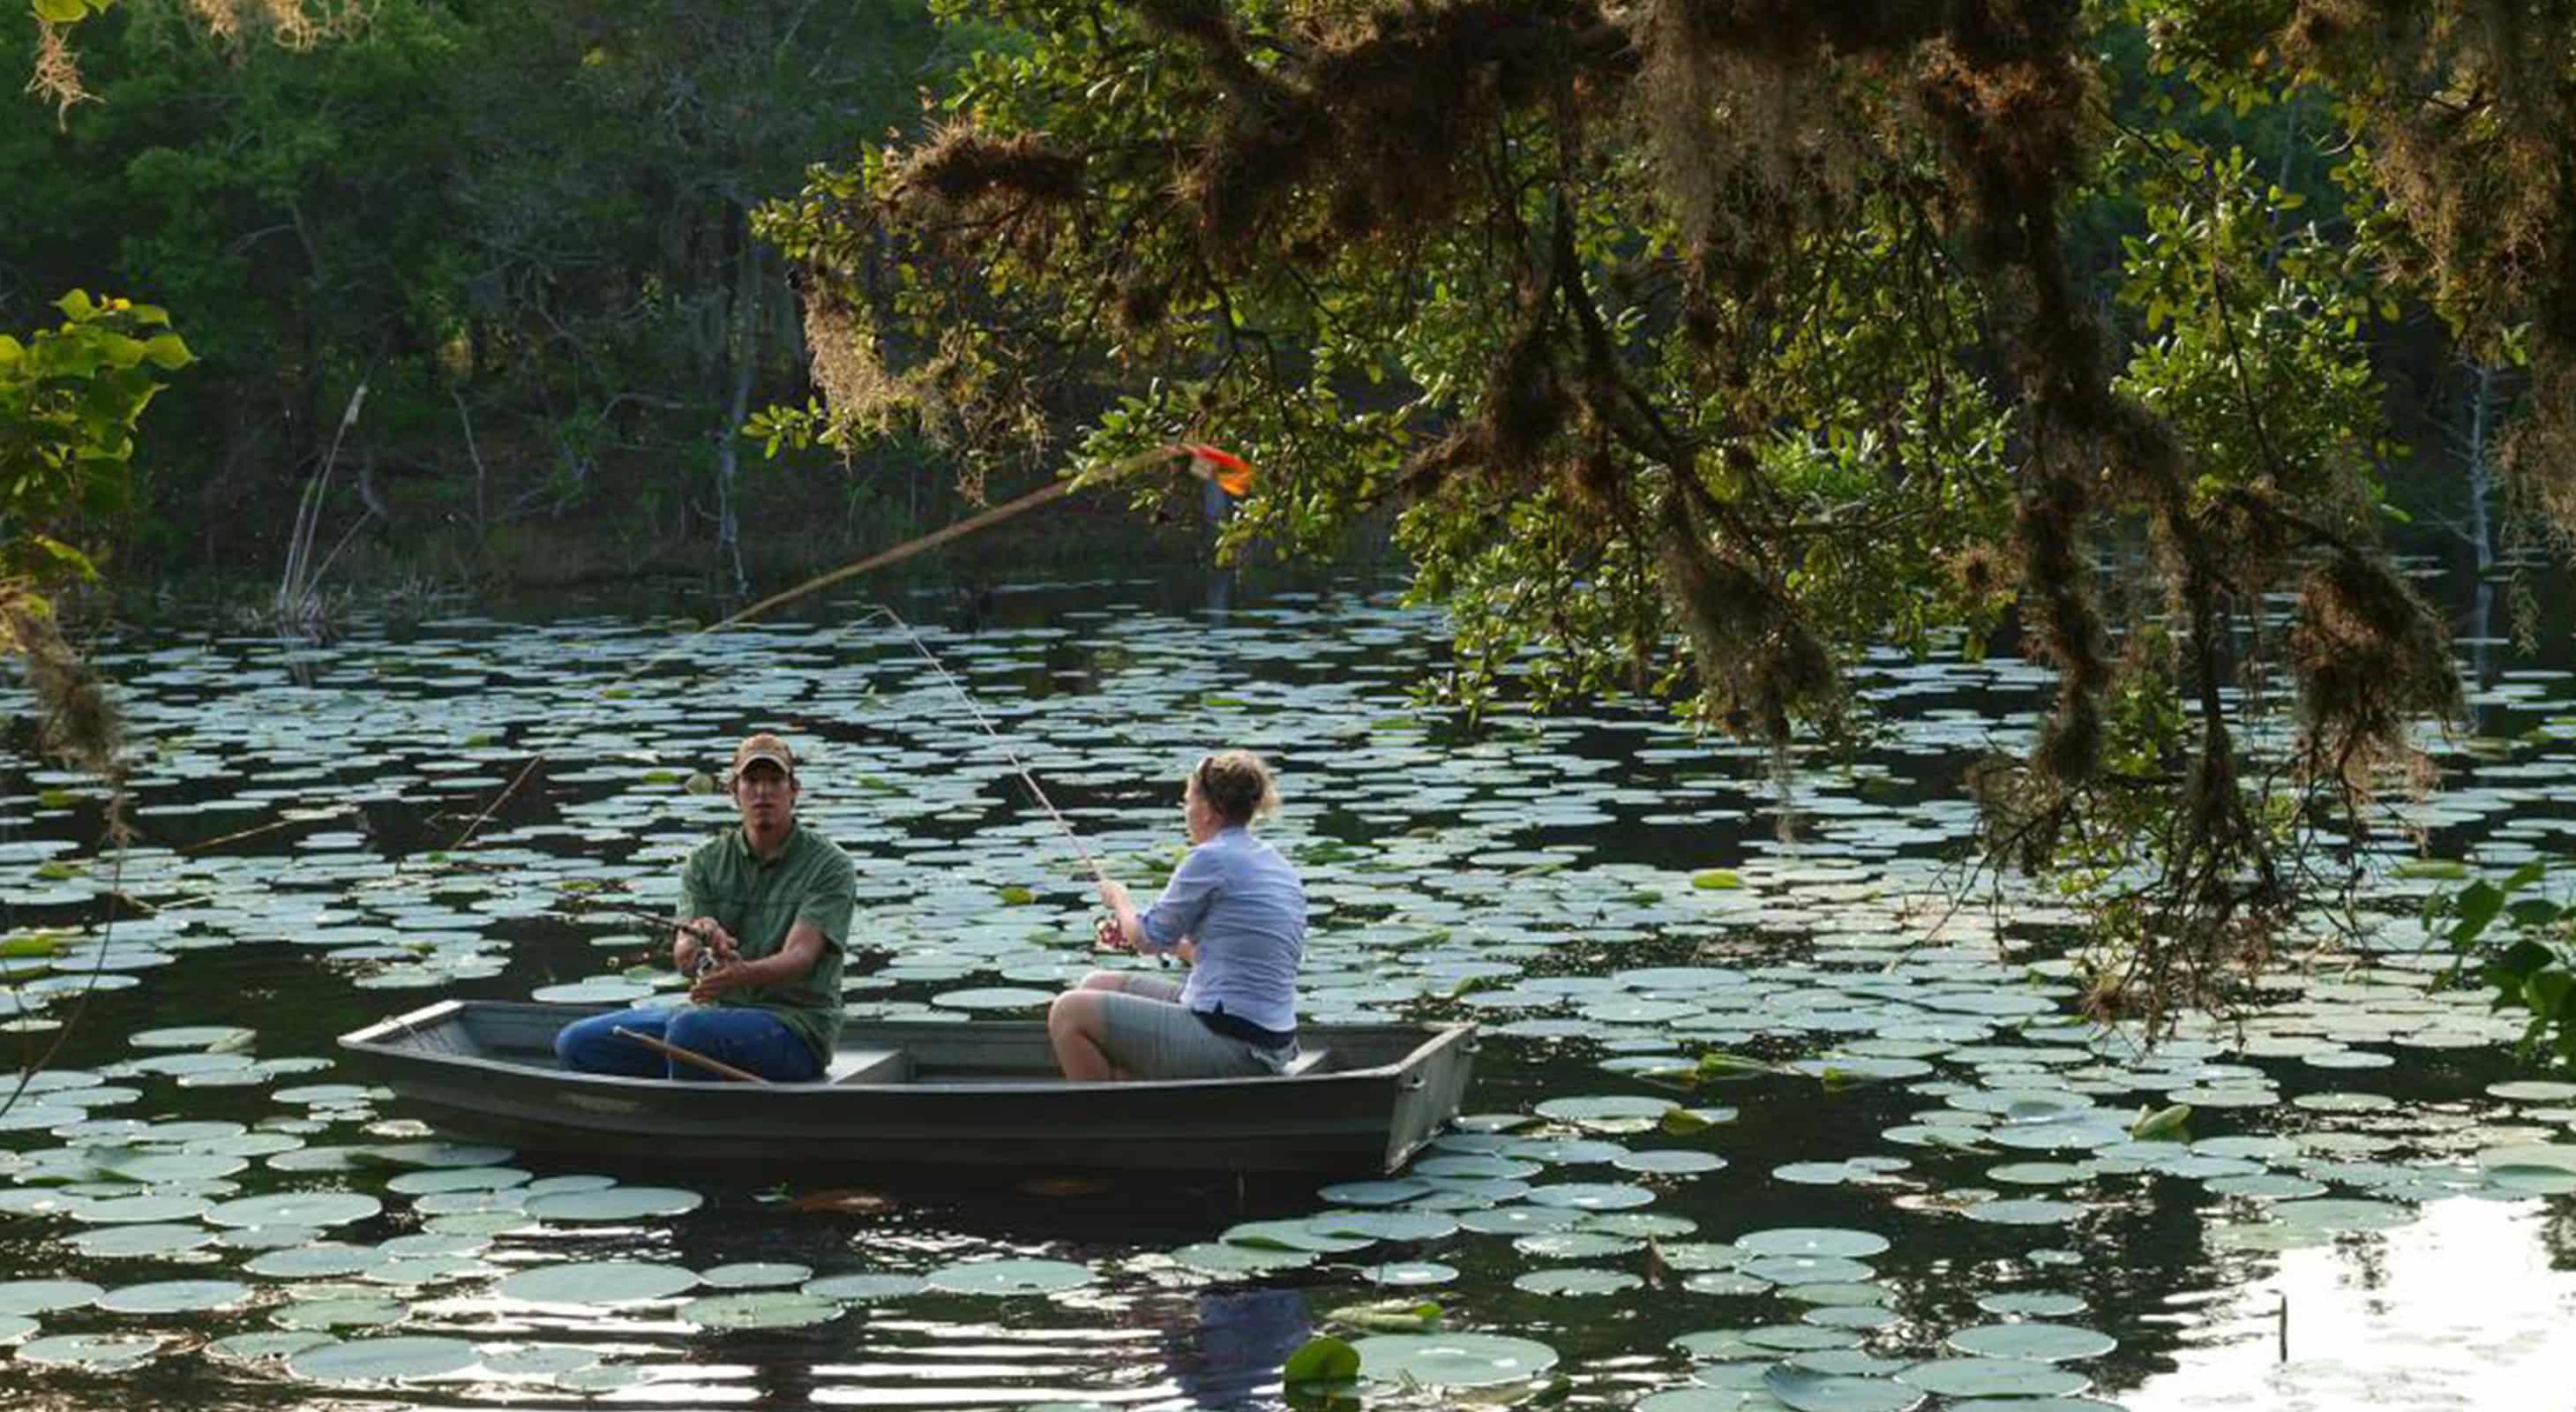 couple in row boat fishing in lake